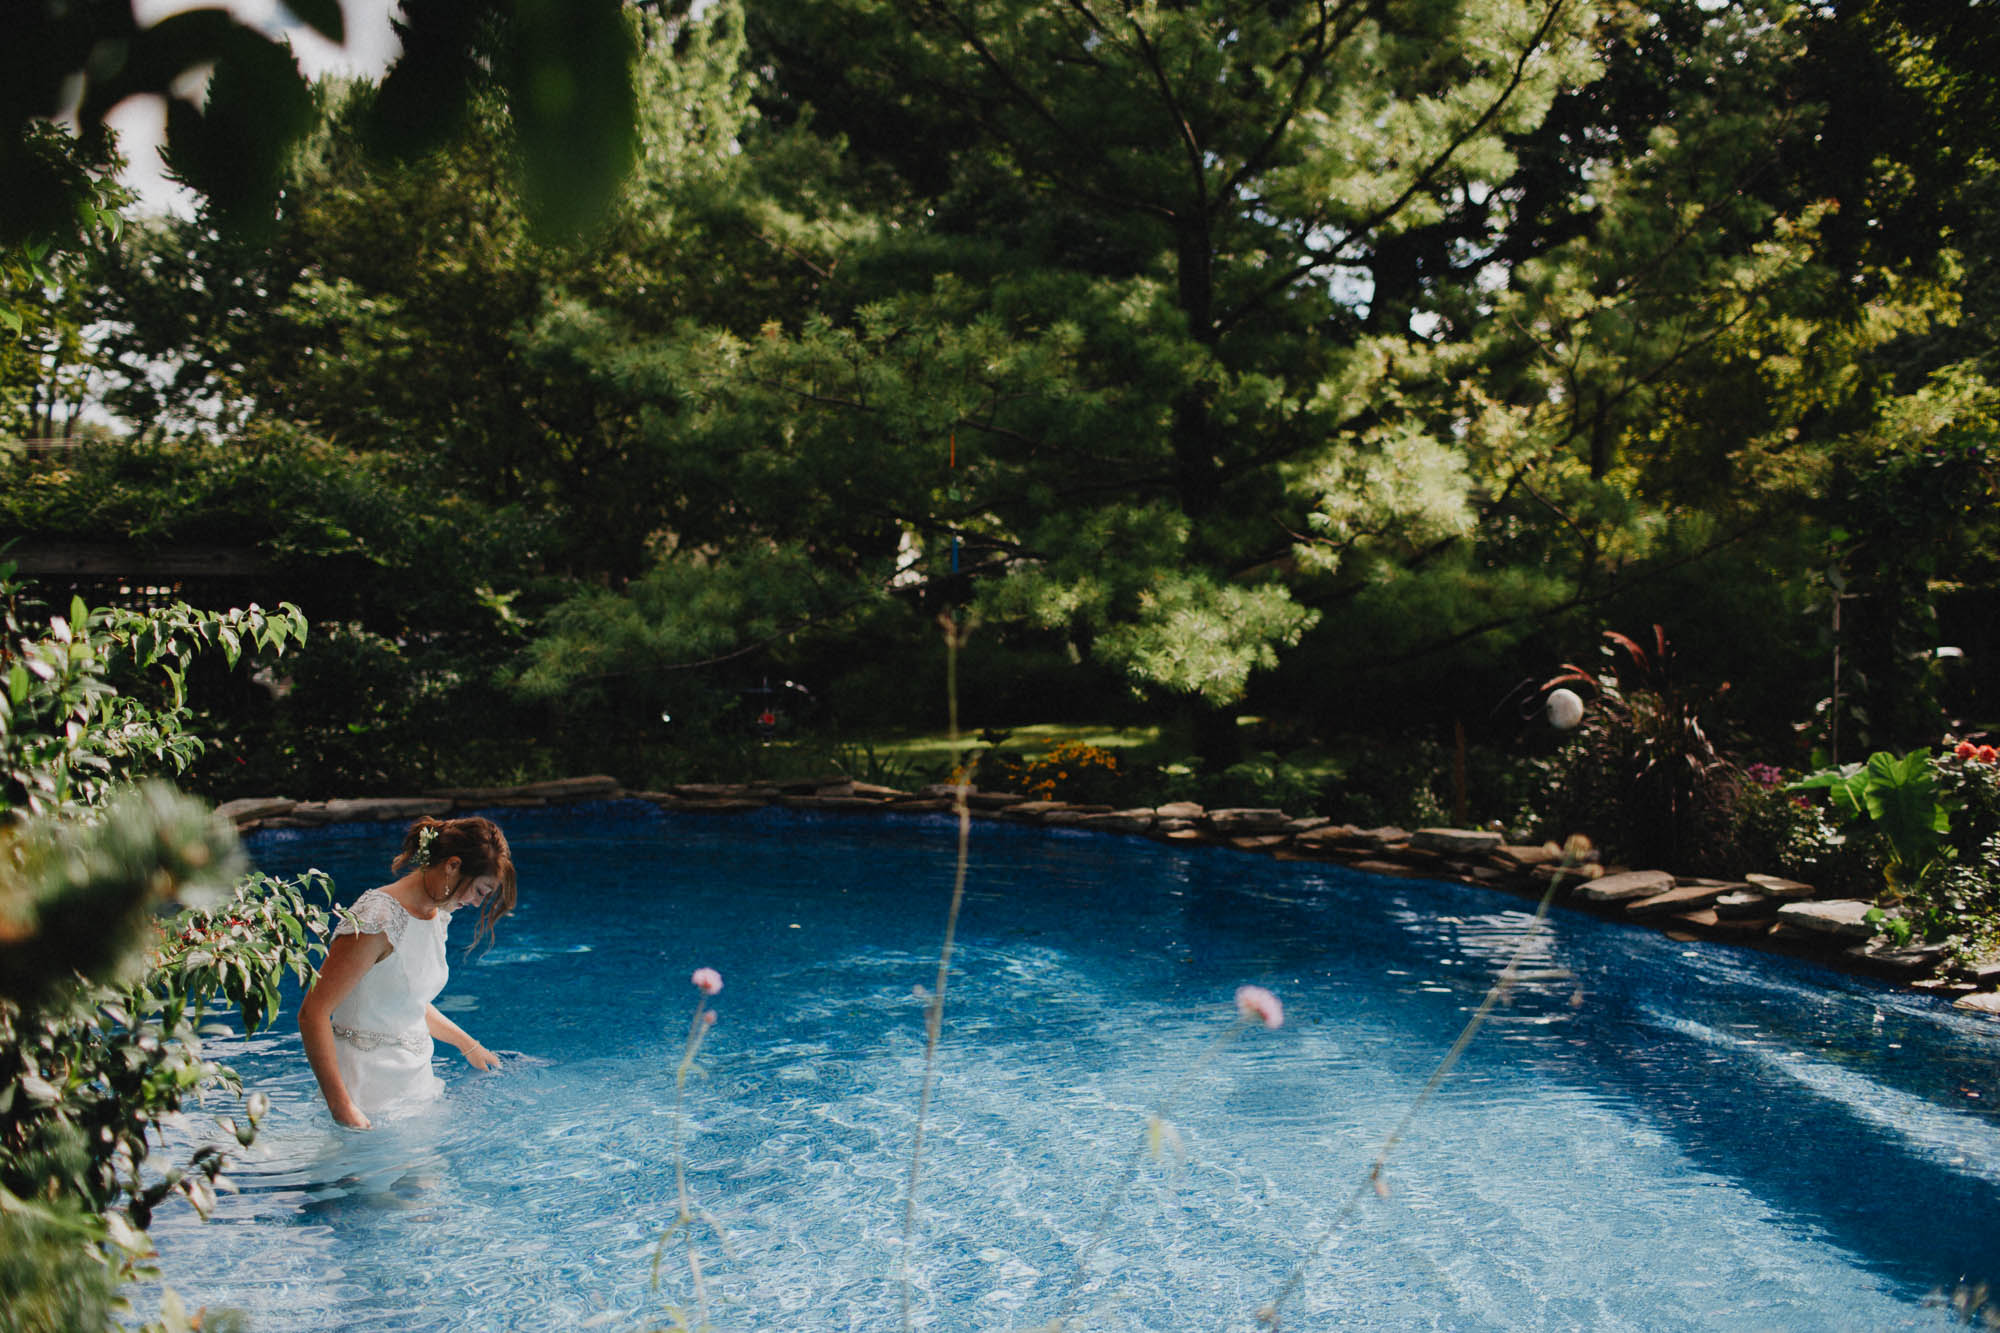 Leah-Graham-Michigan-Outdoor-DIY-Wedding-093@2x.jpg